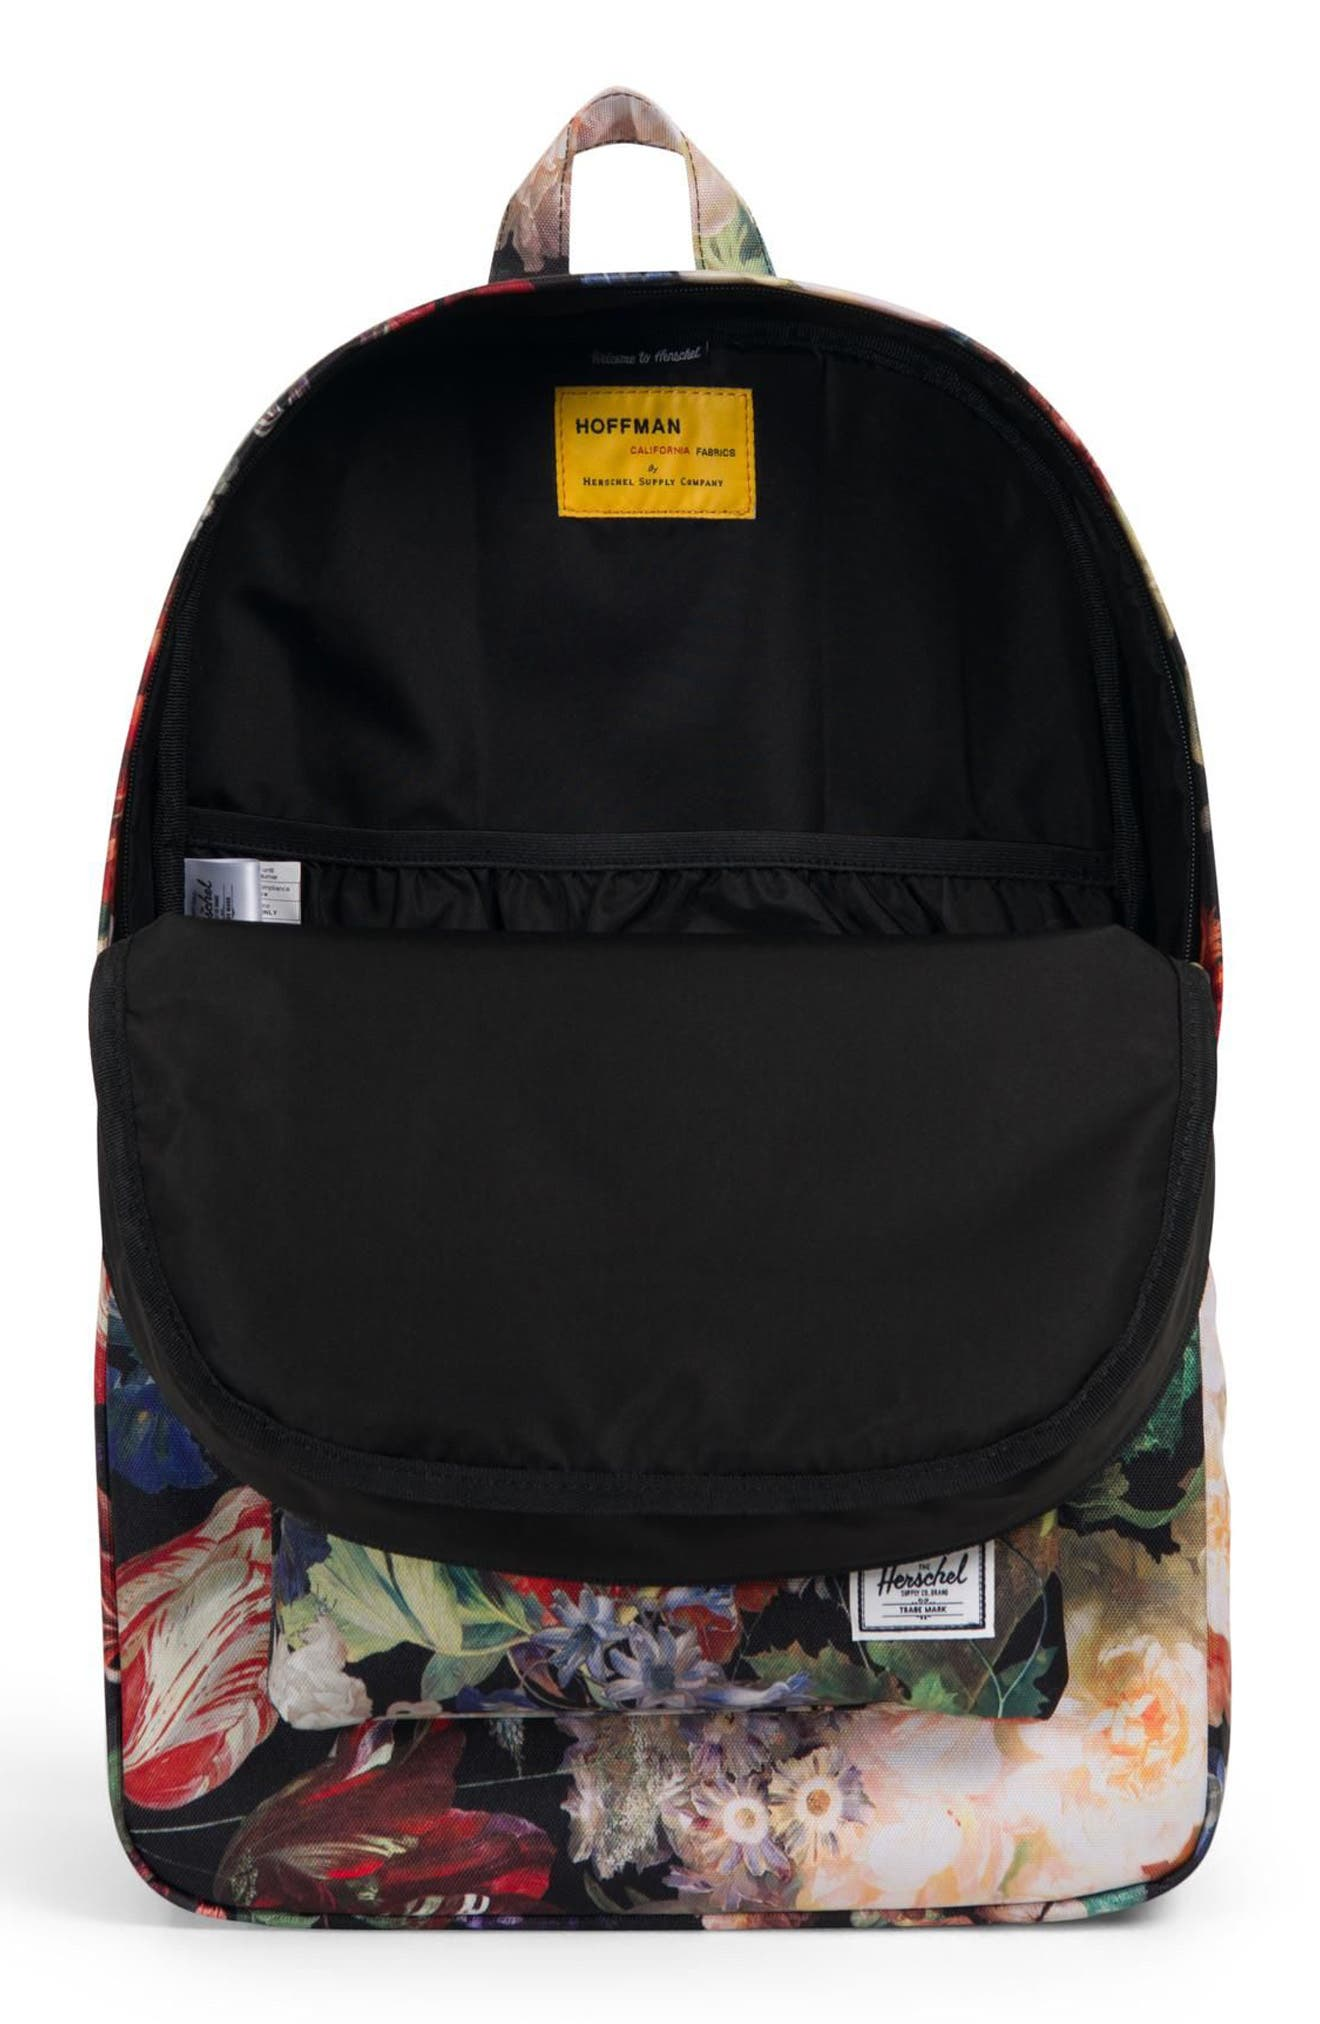 Heritage Hoffman Backpack,                             Main thumbnail 1, color,                             FALL FLORAL